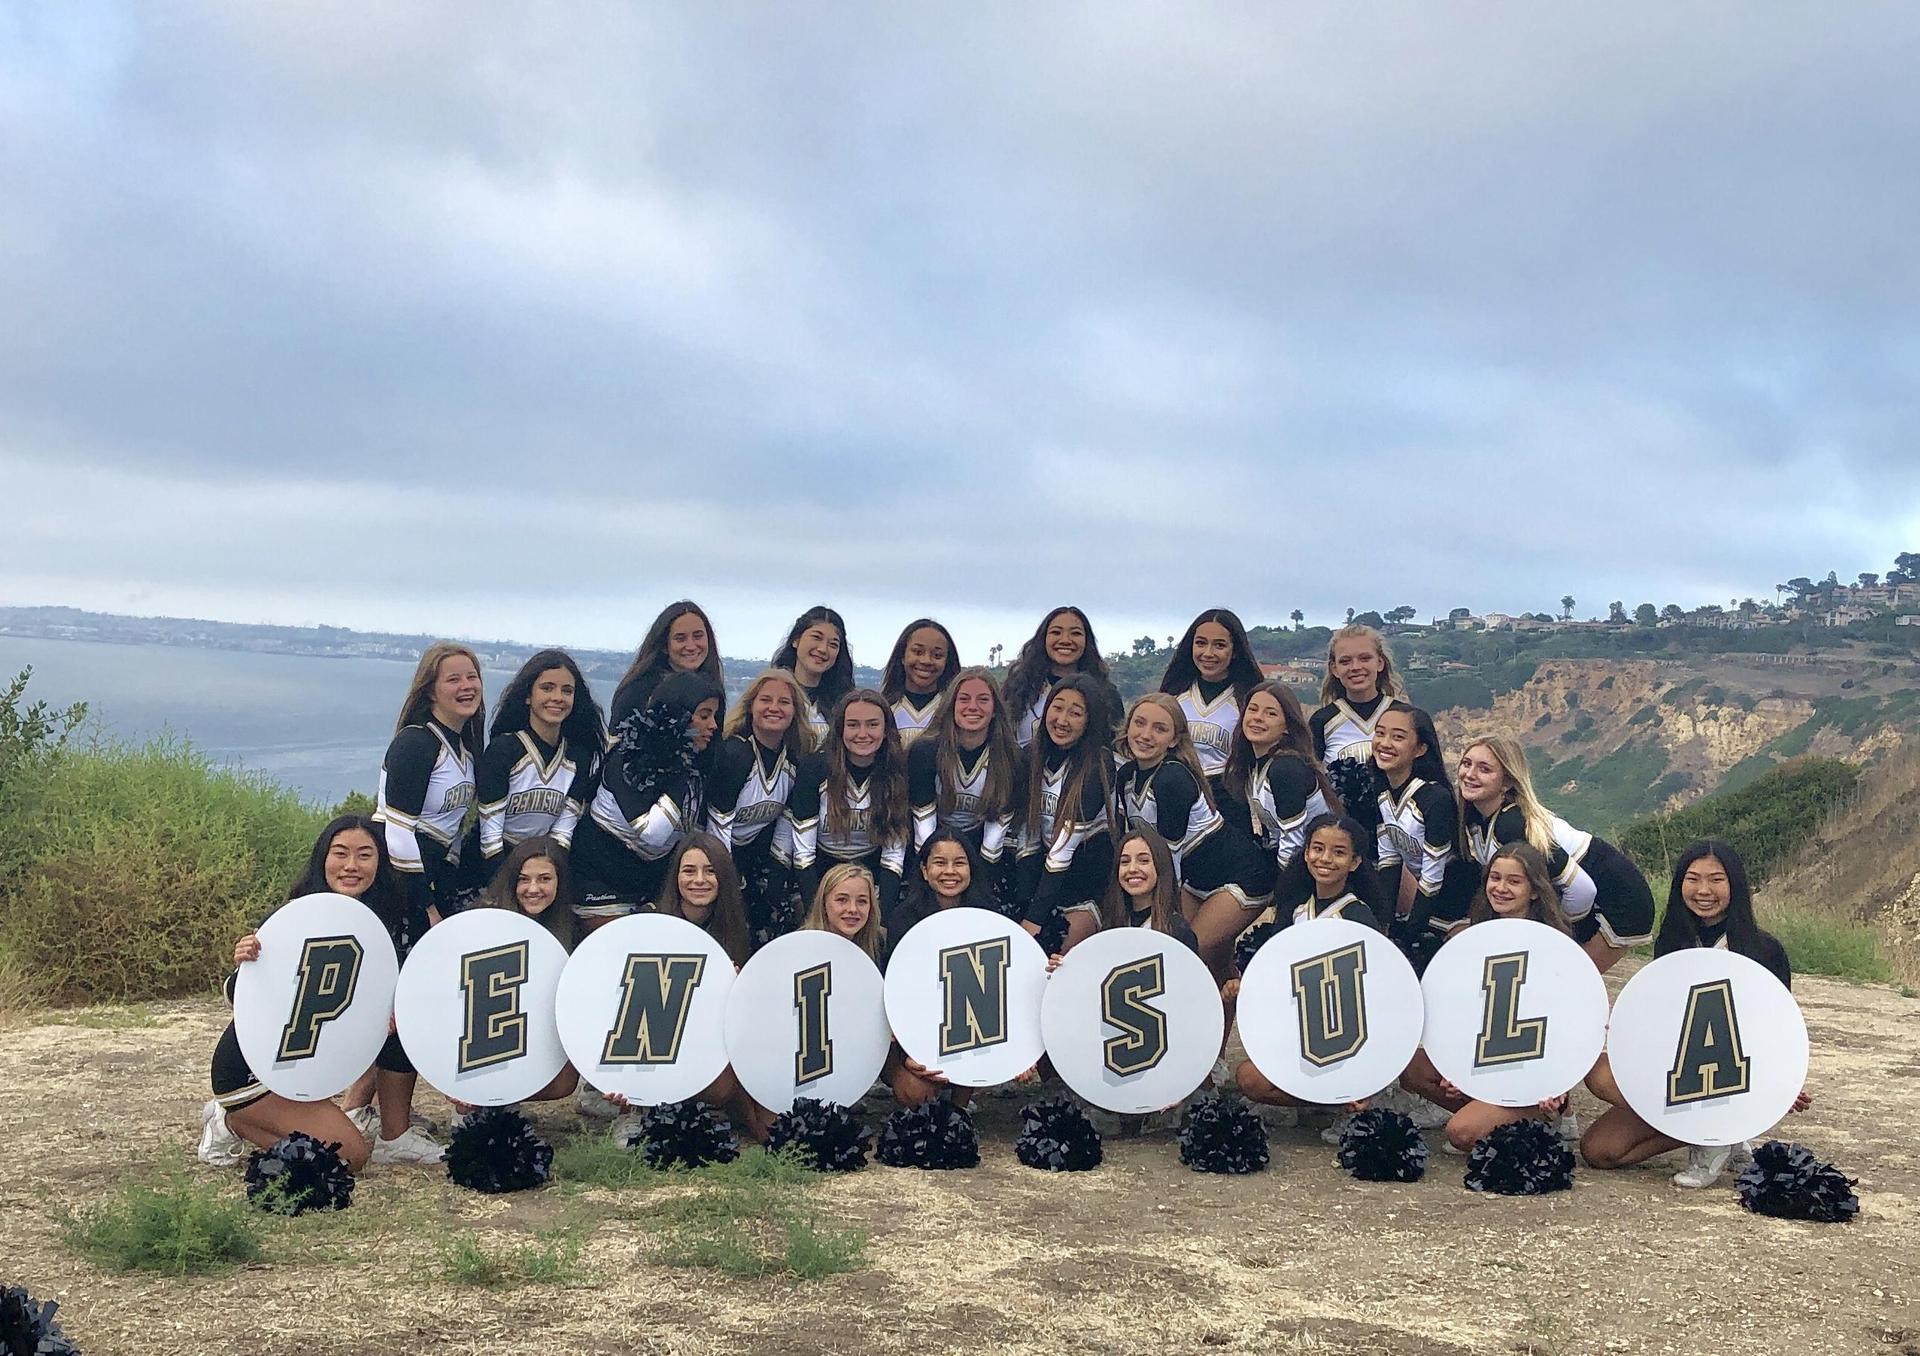 Cheer Team - Athletics / Activities - Palos Verdes Pertaining To Palos Verdes School District Calendar 2021